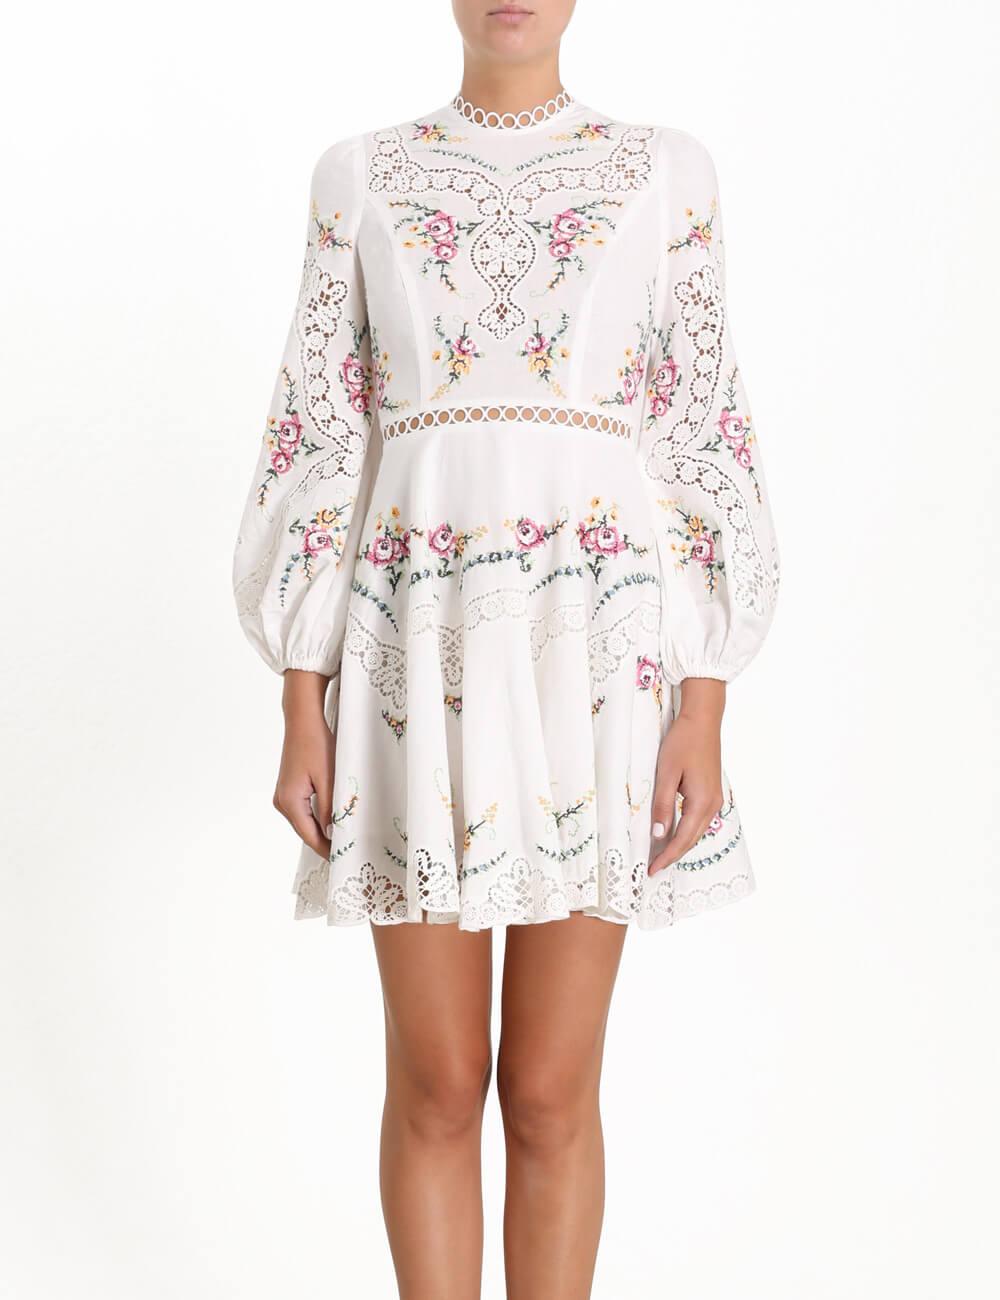 Allia Cross Stitch Short Dress